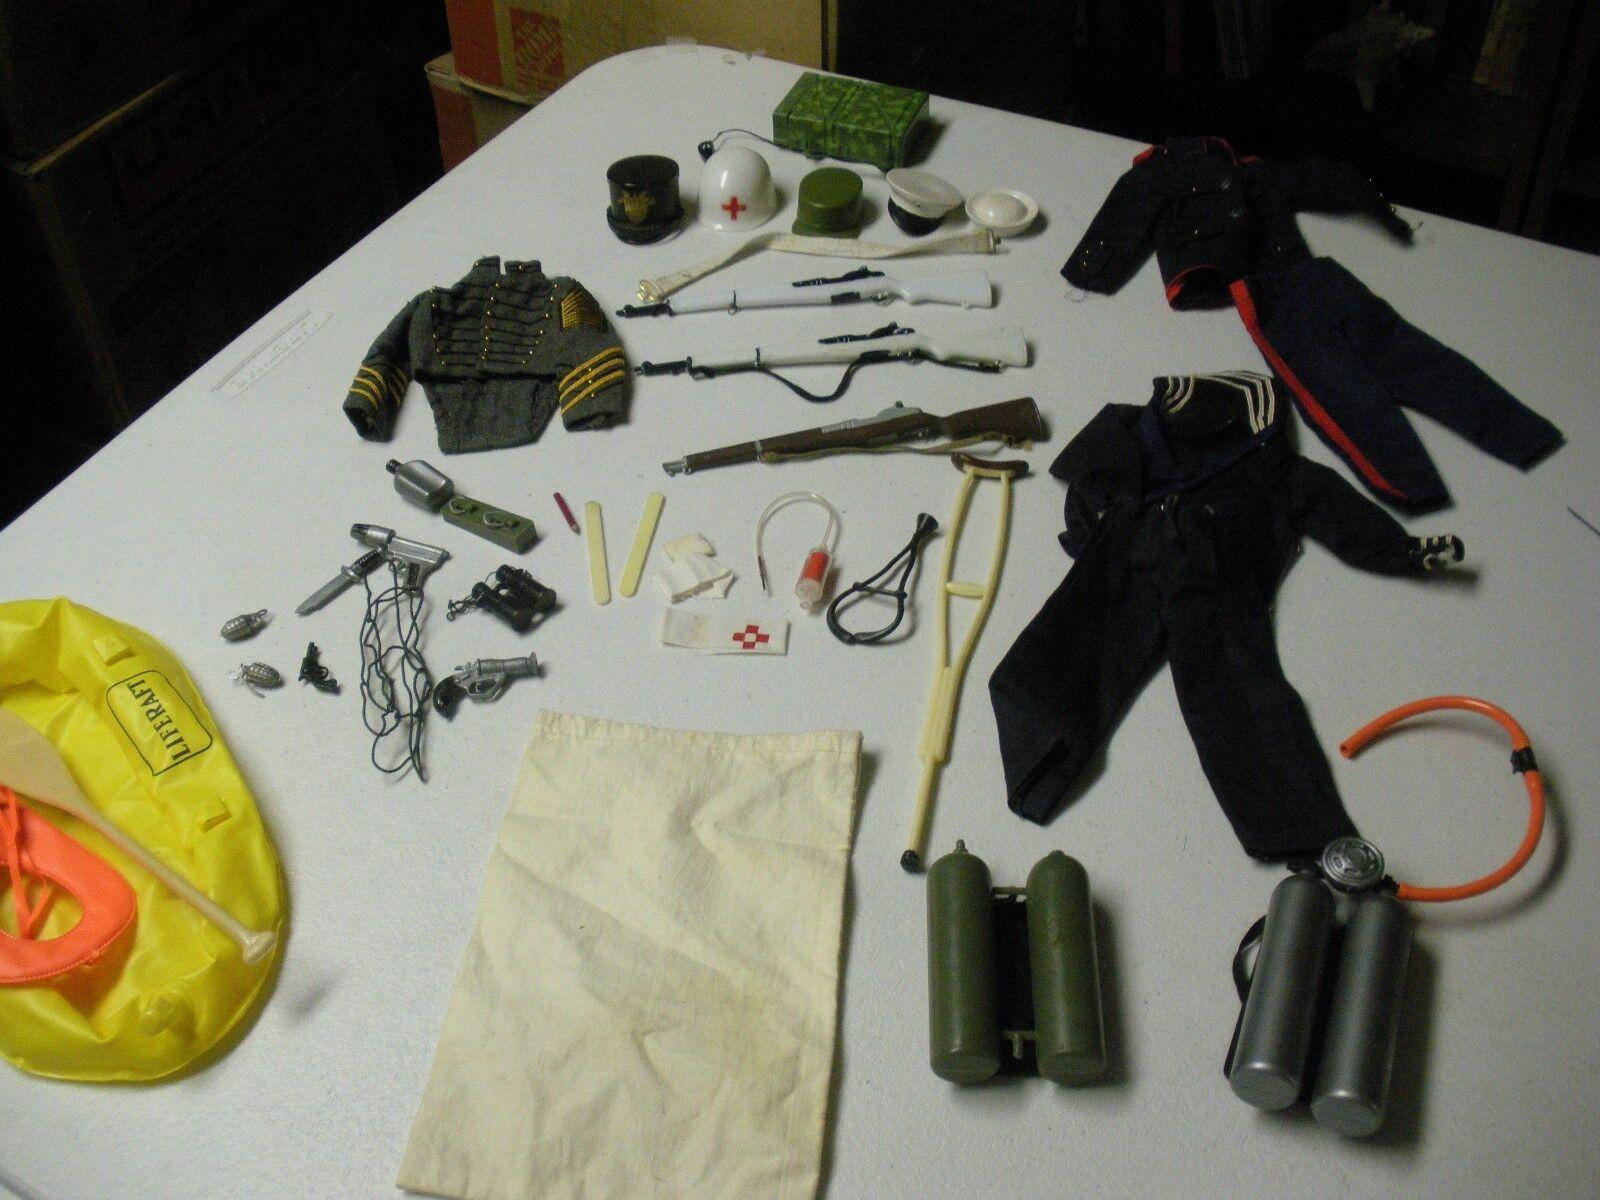 G.I. Joe Oreiginal 1960's Lot Of Original Accesories Rifles, Helmets, Uniforms +